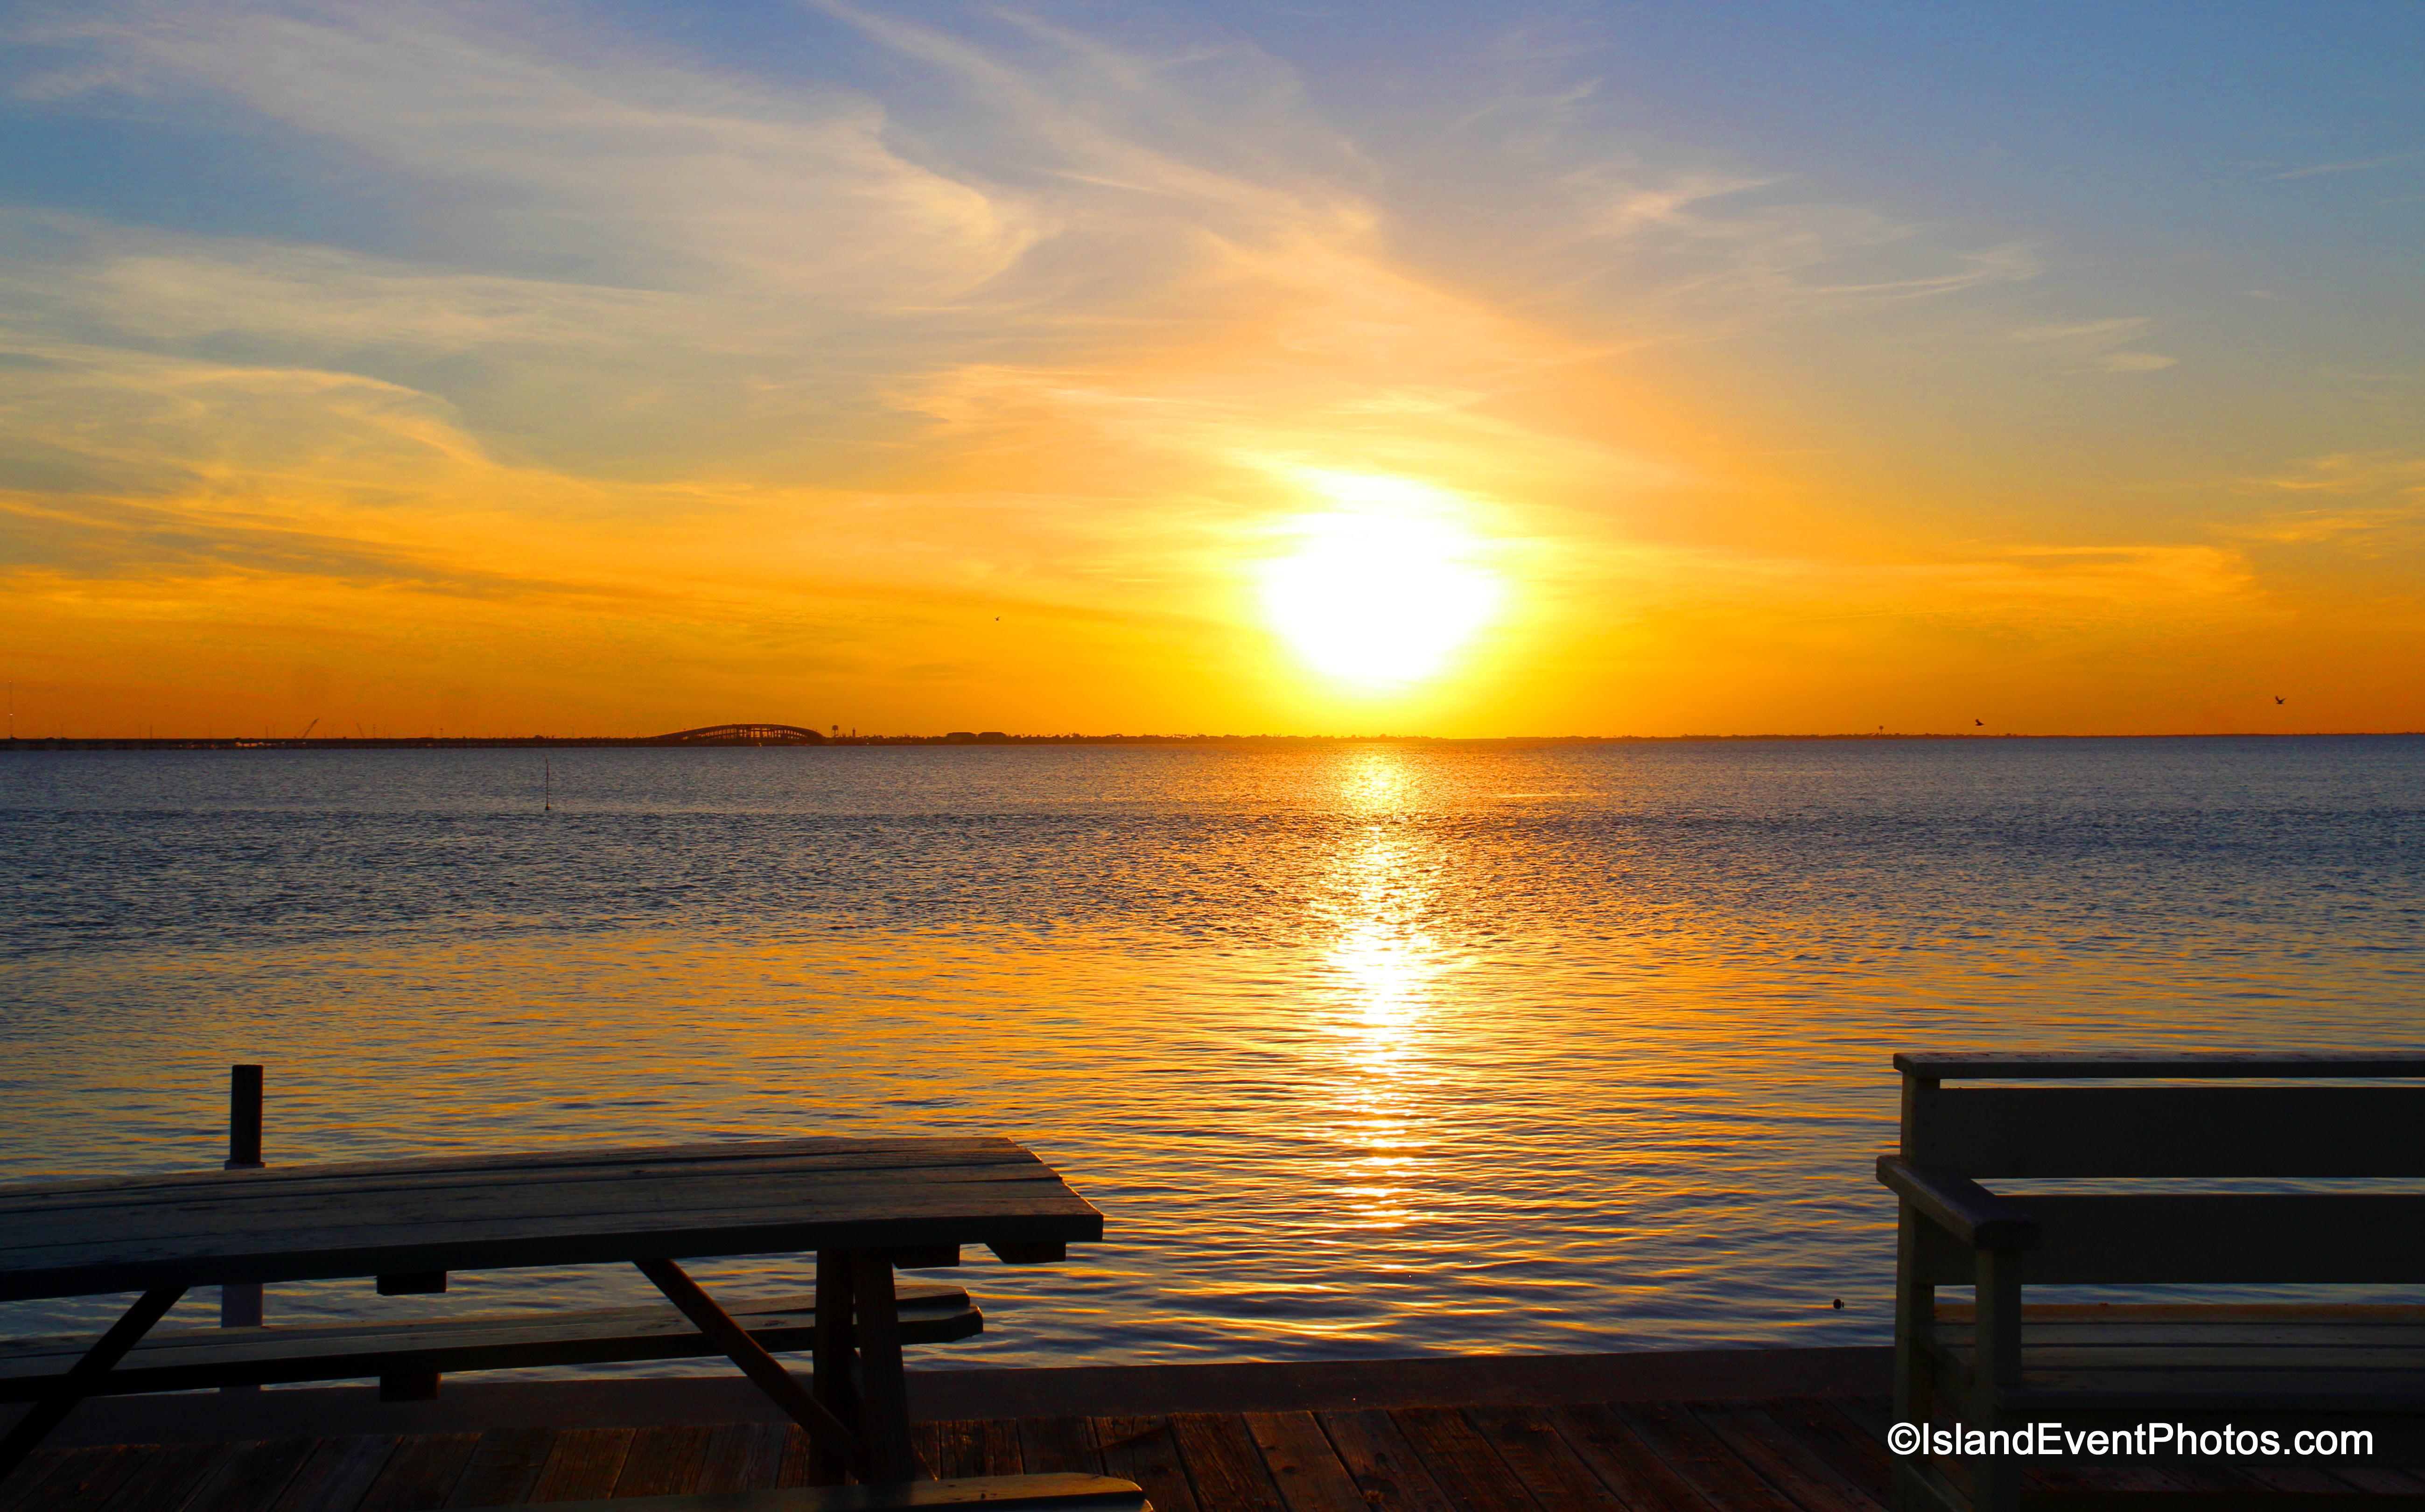 Bay side South Padre Island, TX.